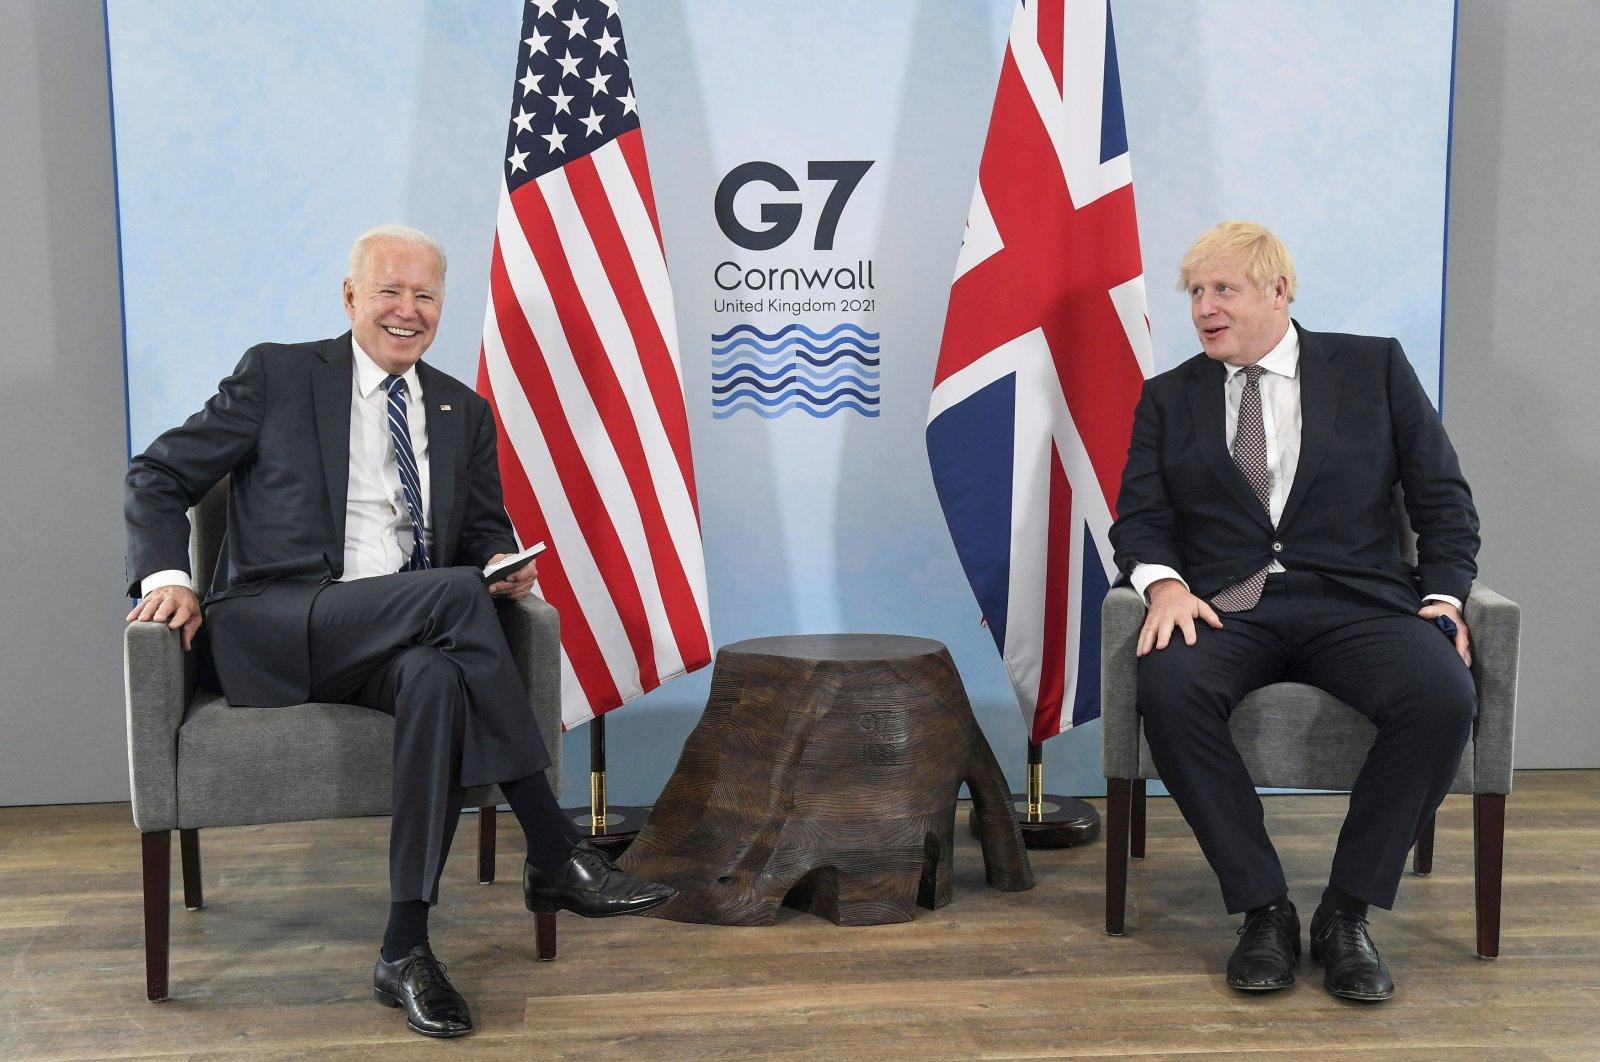 U.S. President Joe Biden (L) speaks with Britain's Prime Minister Boris Johnson during their meeting ahead of the G7 summit in Cornwall, Britain, Thursday, June 10, 2021. (AP Photo)